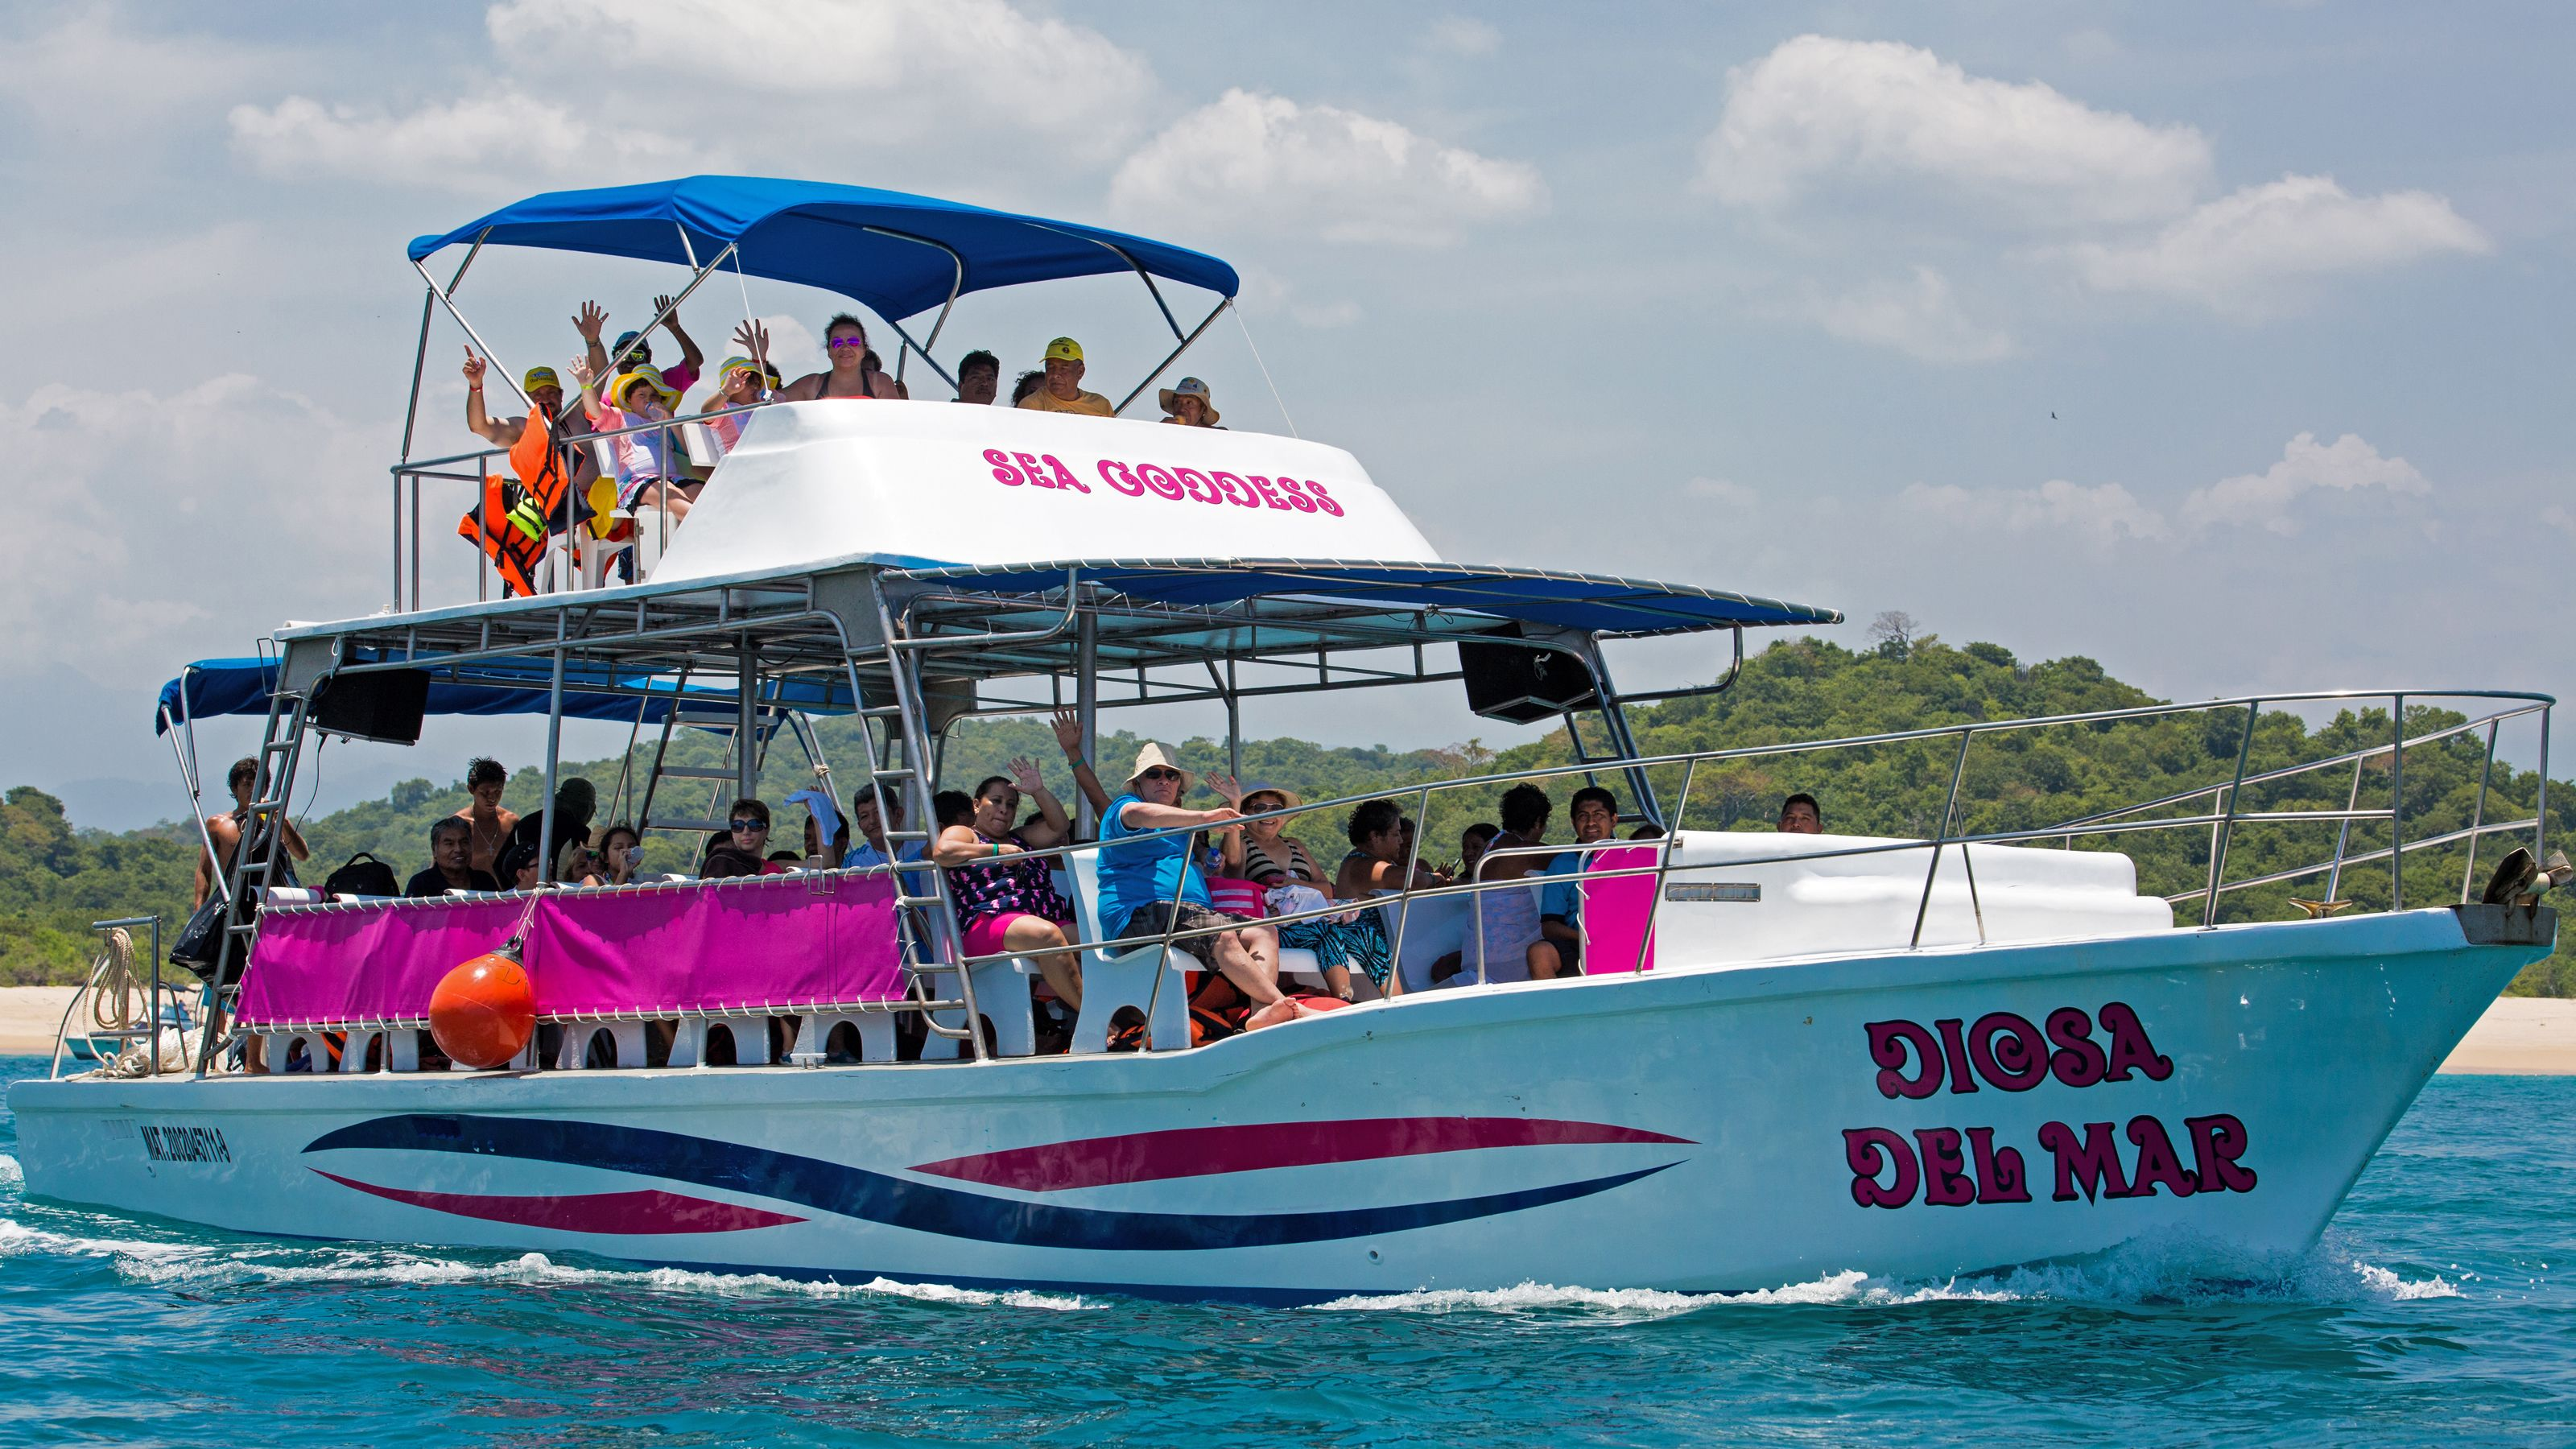 Coastal Bays Boat Tour